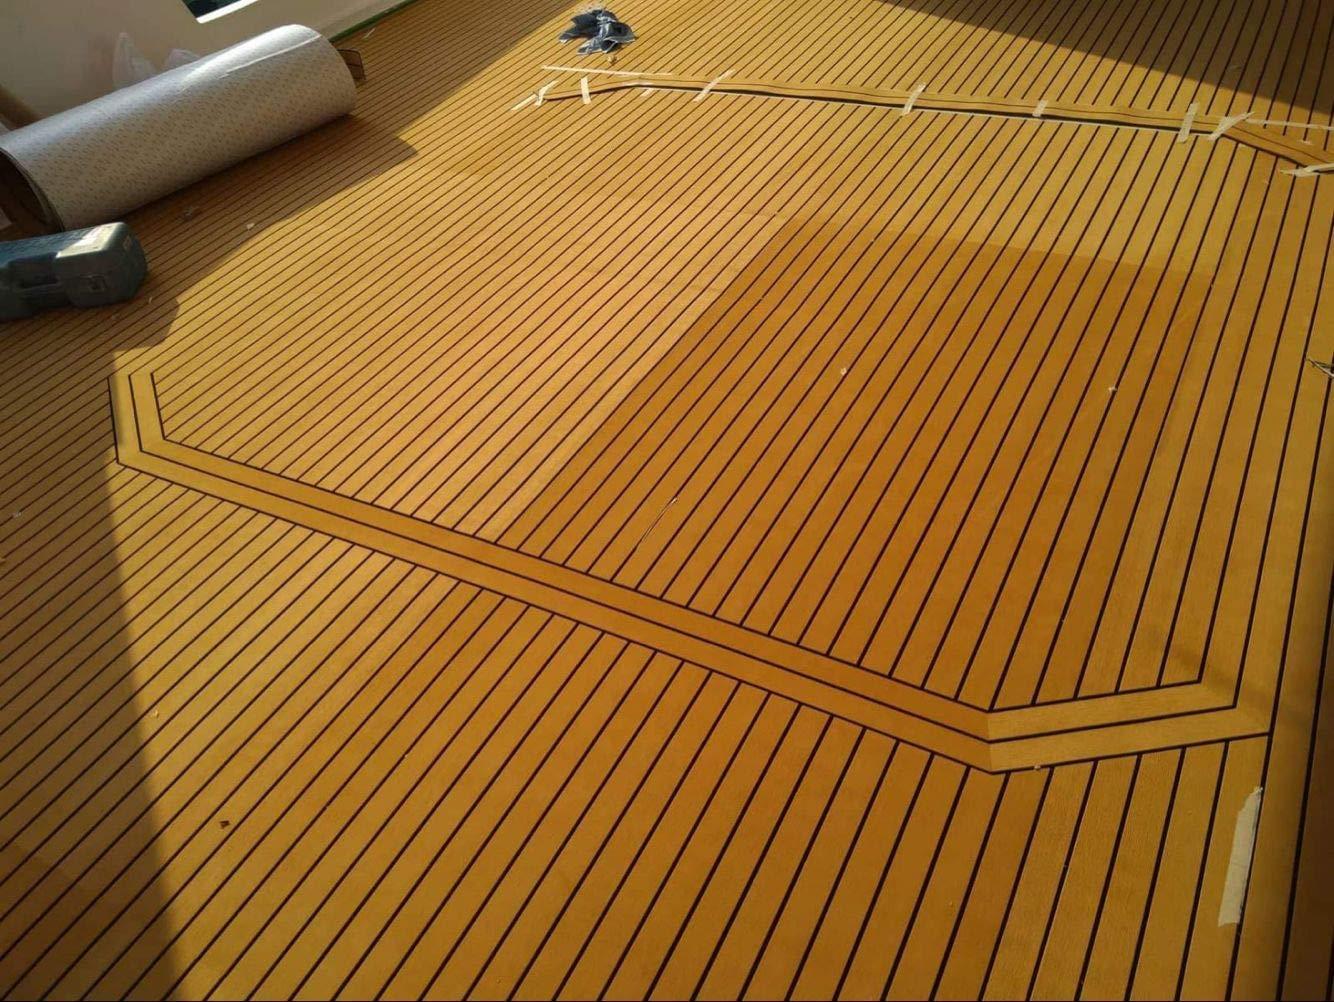 CHURERSHINING EVA Faux Teak Decking Sheet for Boat Yacht Marine Flooring Mat Non Skip Mat Self-Adhesive Carpet 35.4'' x94.5'' Light Brown/Grey (Light Brown) by CHURERSHINING